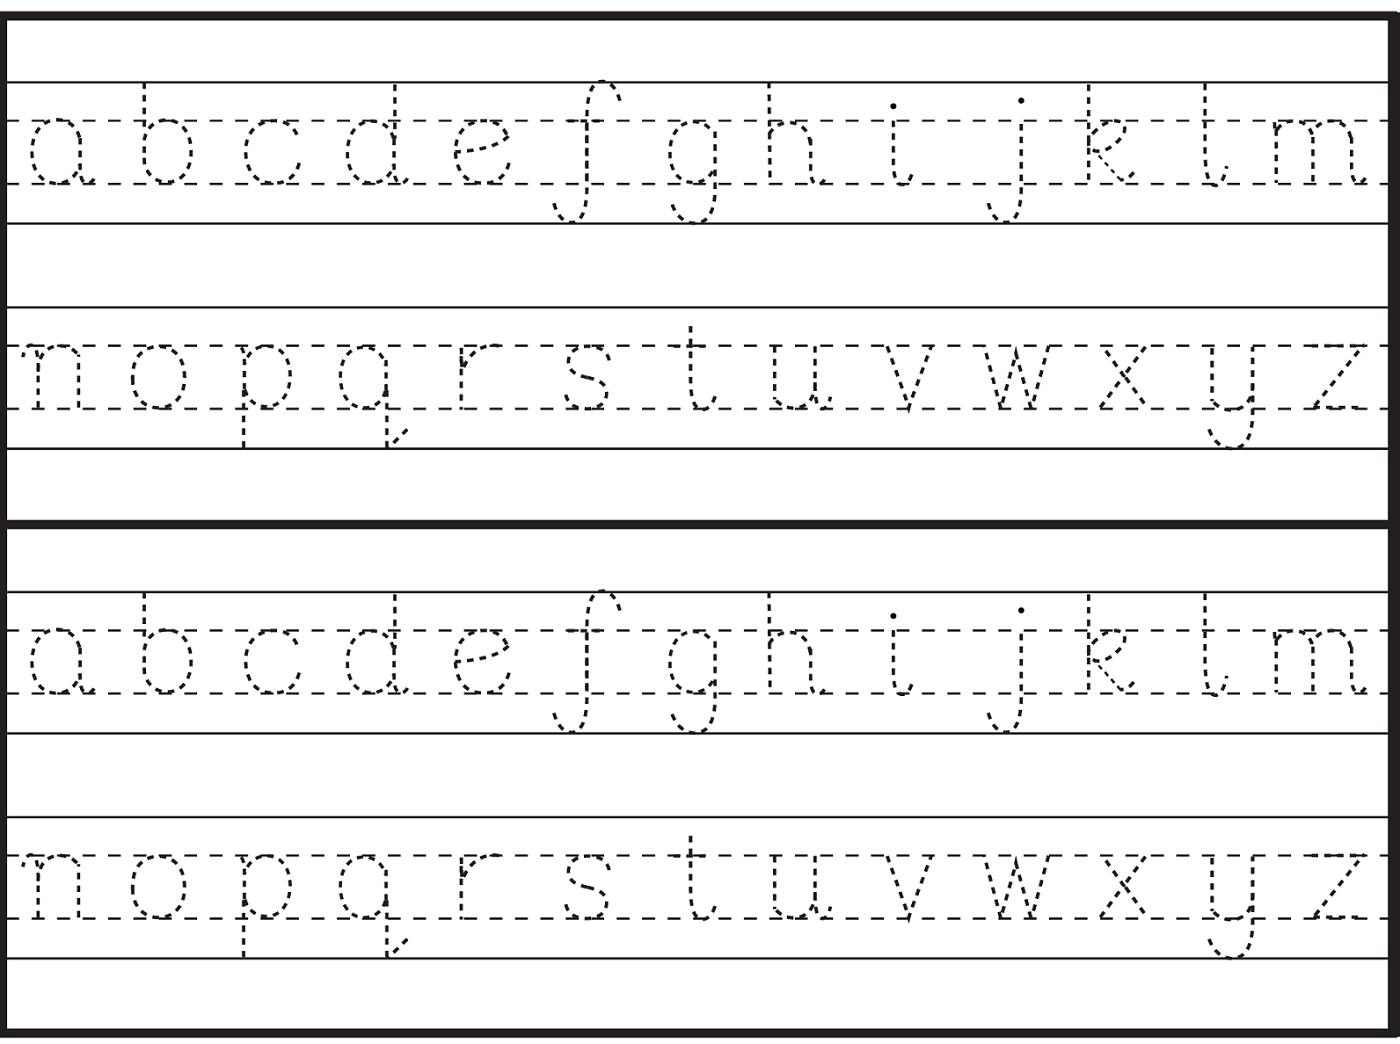 Trace Letters Worksheet For Grade 1